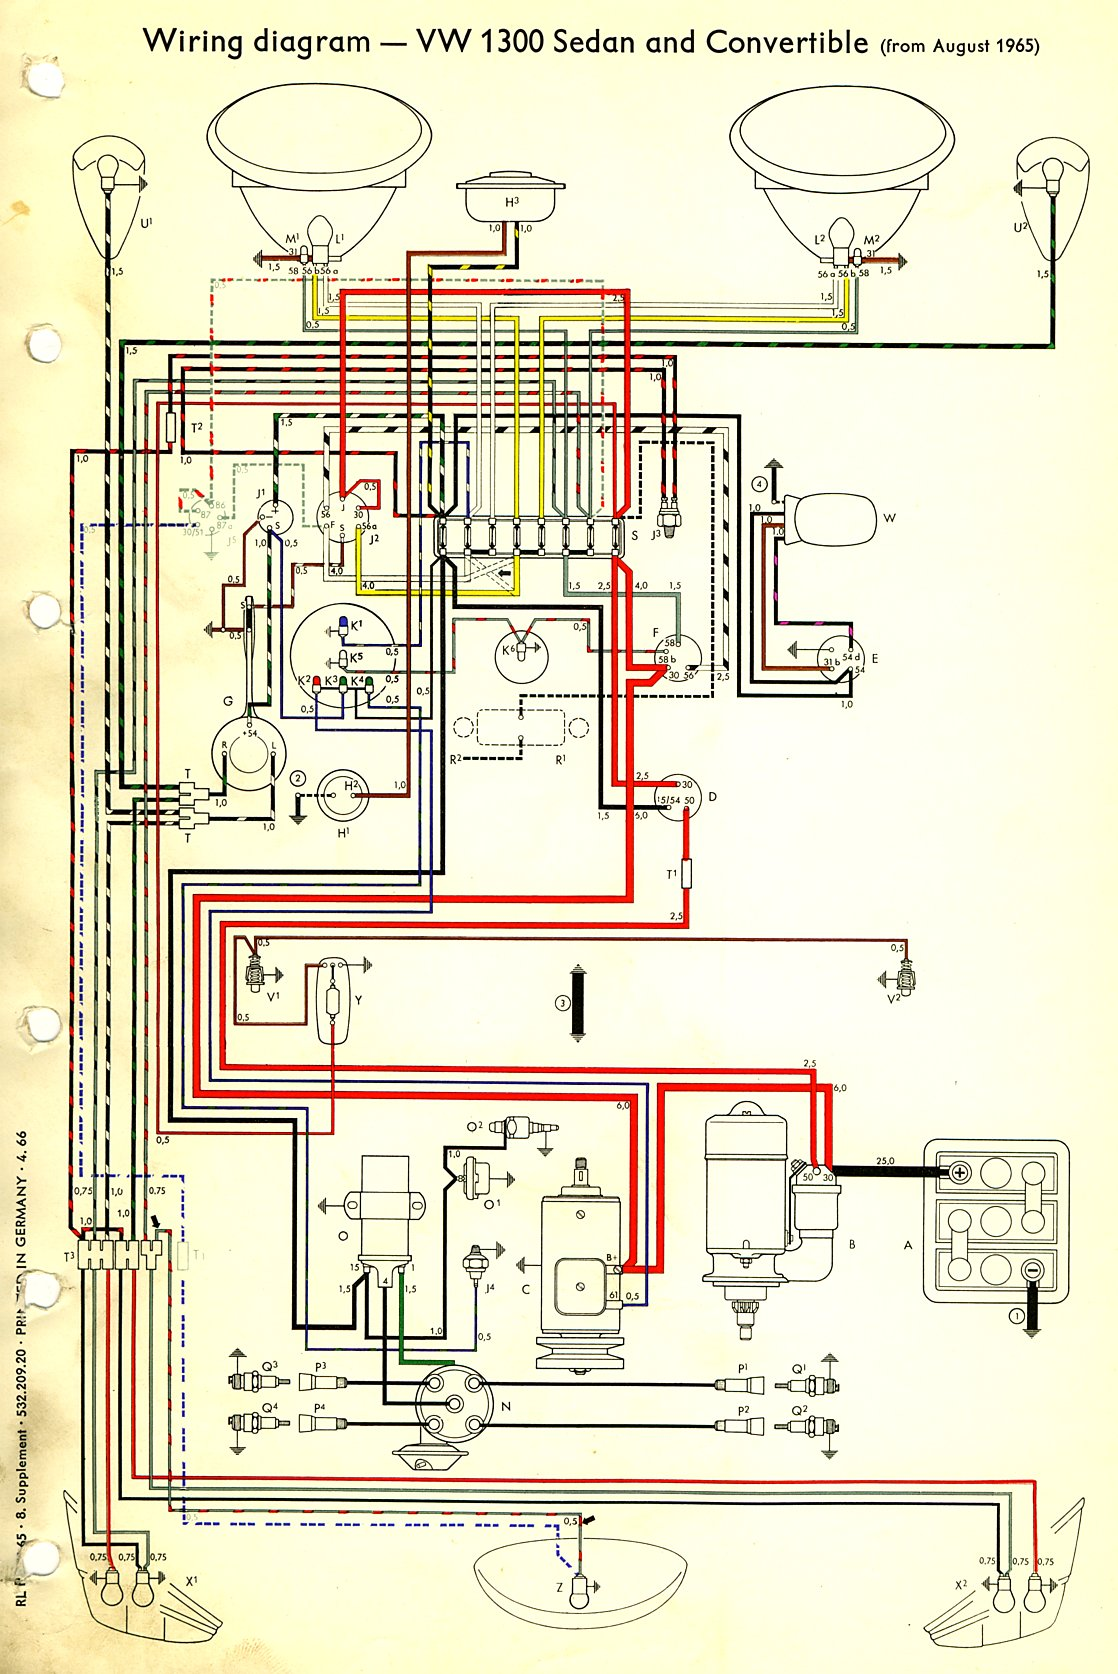 1968 Vw Bug Wiring Diagram 1966 Beetle Wiring Diagram Thegoldenbug Com